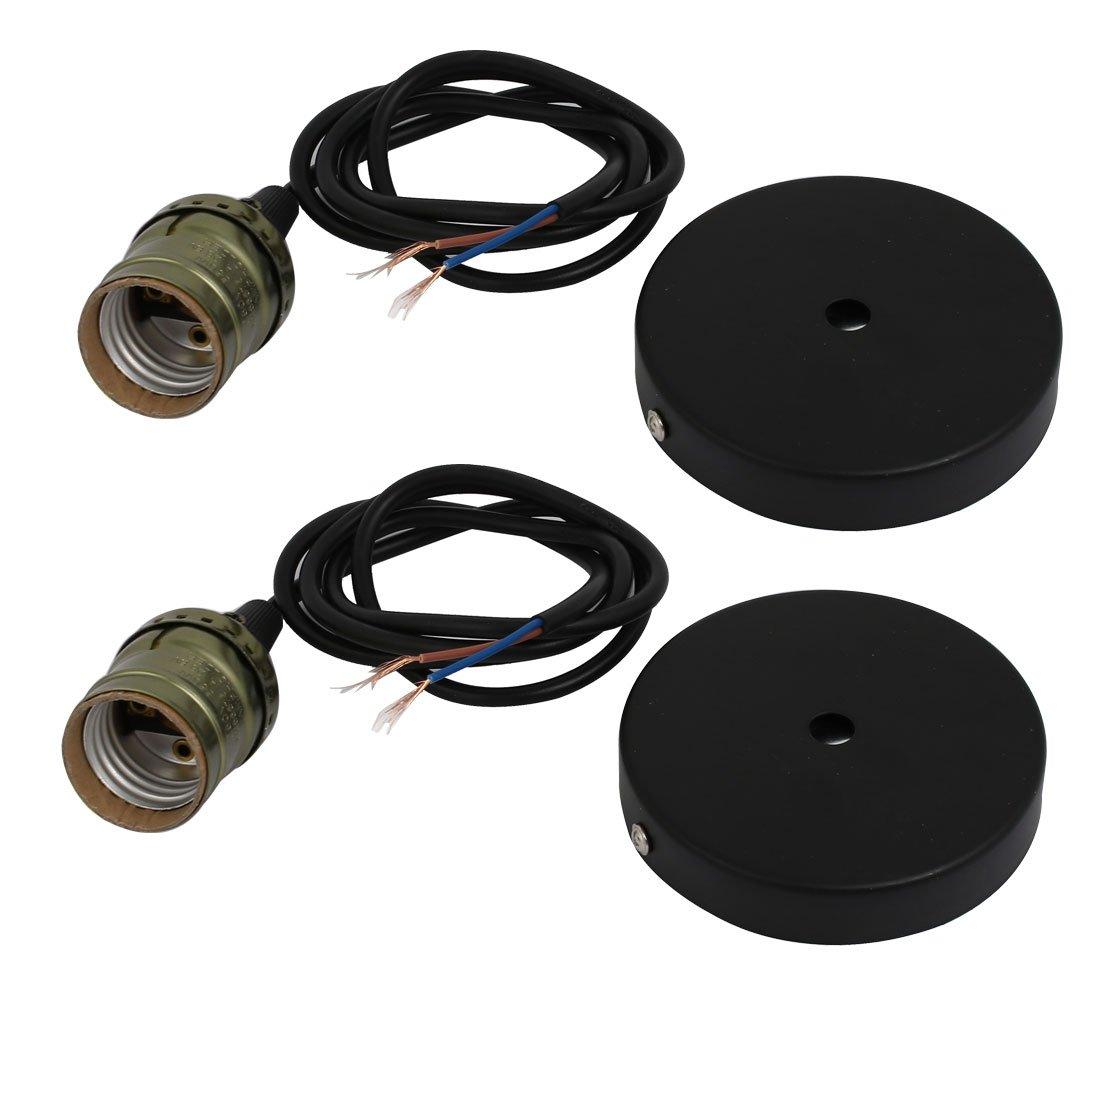 uxcell 2pcs E27 Base Aluminum Shell Lamp Holder Light Socket Bronze Tone w 100mm Dia Fixture